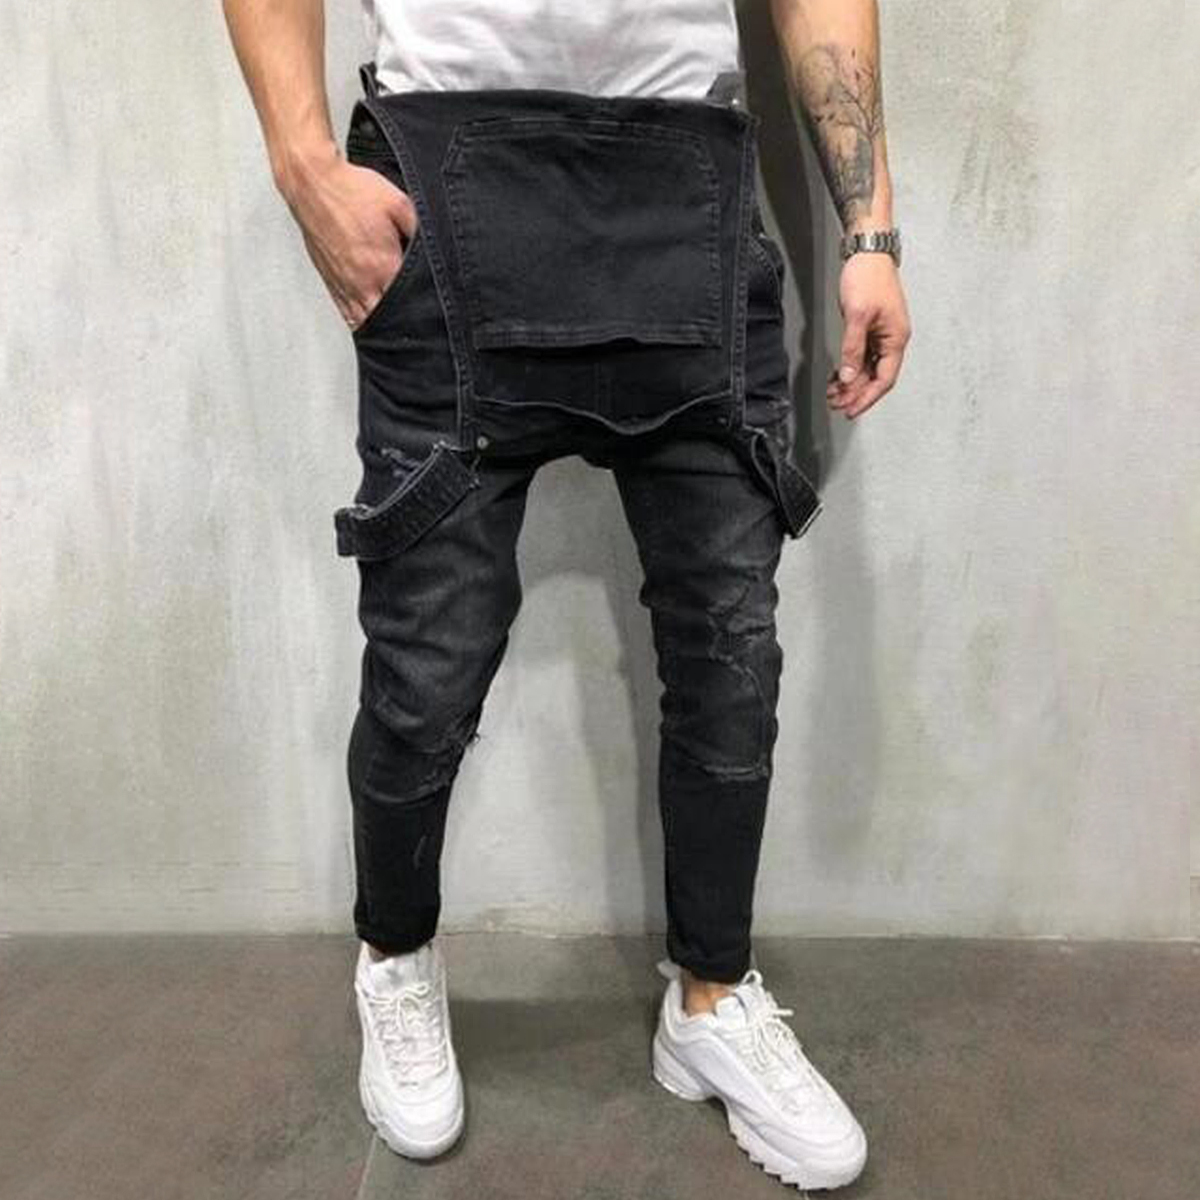 Correa-De-Hombre-Denim-Jeans-Mono-Mono-corto-Dungaree-Pantalones-Cortos-Deshilachados-Babero-En miniatura 27